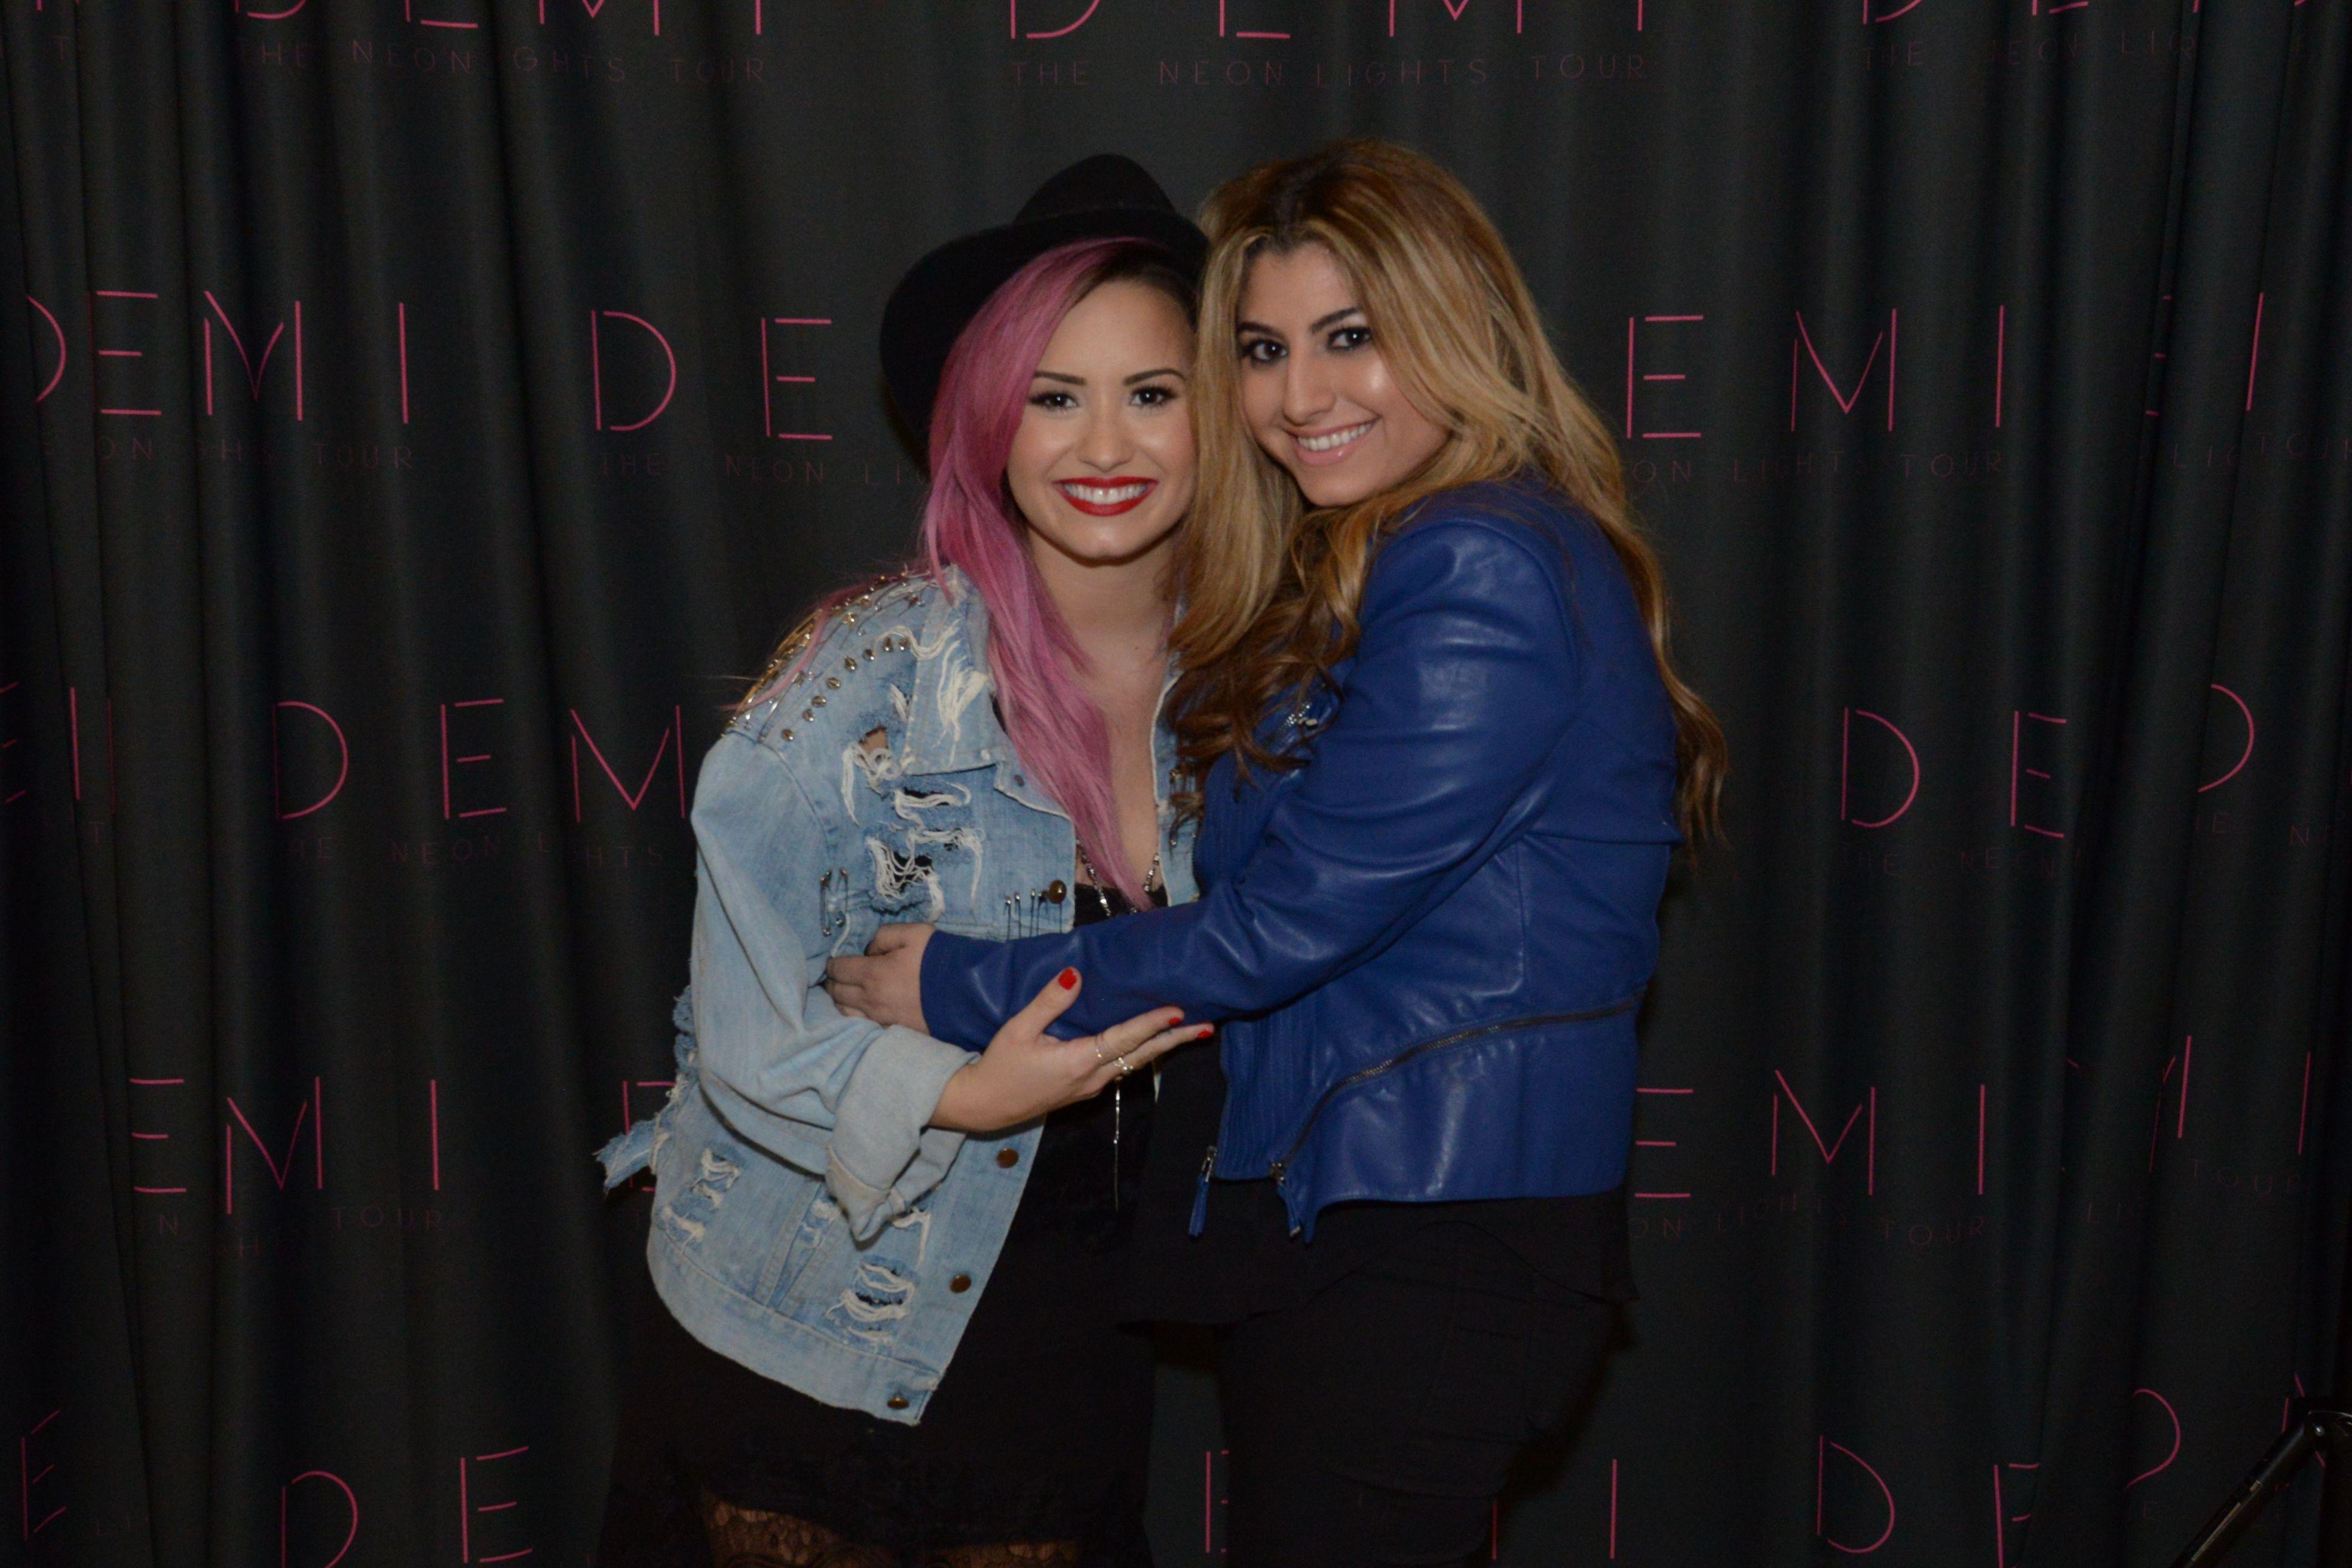 Demi Lovato Anaheim Meet Greet Pix Demi Lovato Celebrity Anaheim